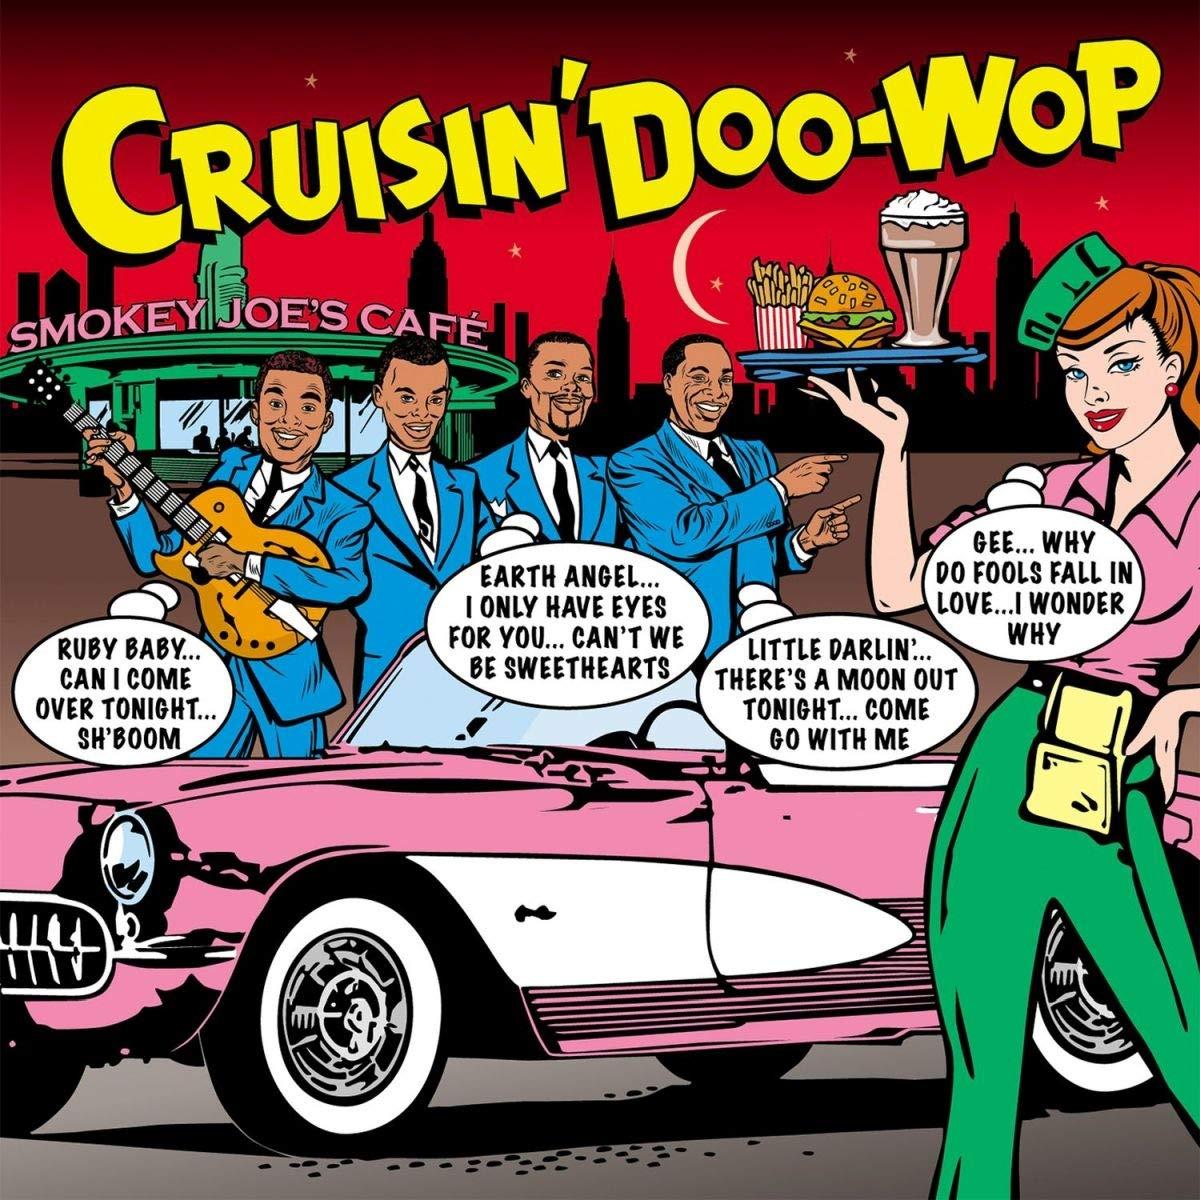 VA - Cruisin' Doo-Wop (3CD, 2019)